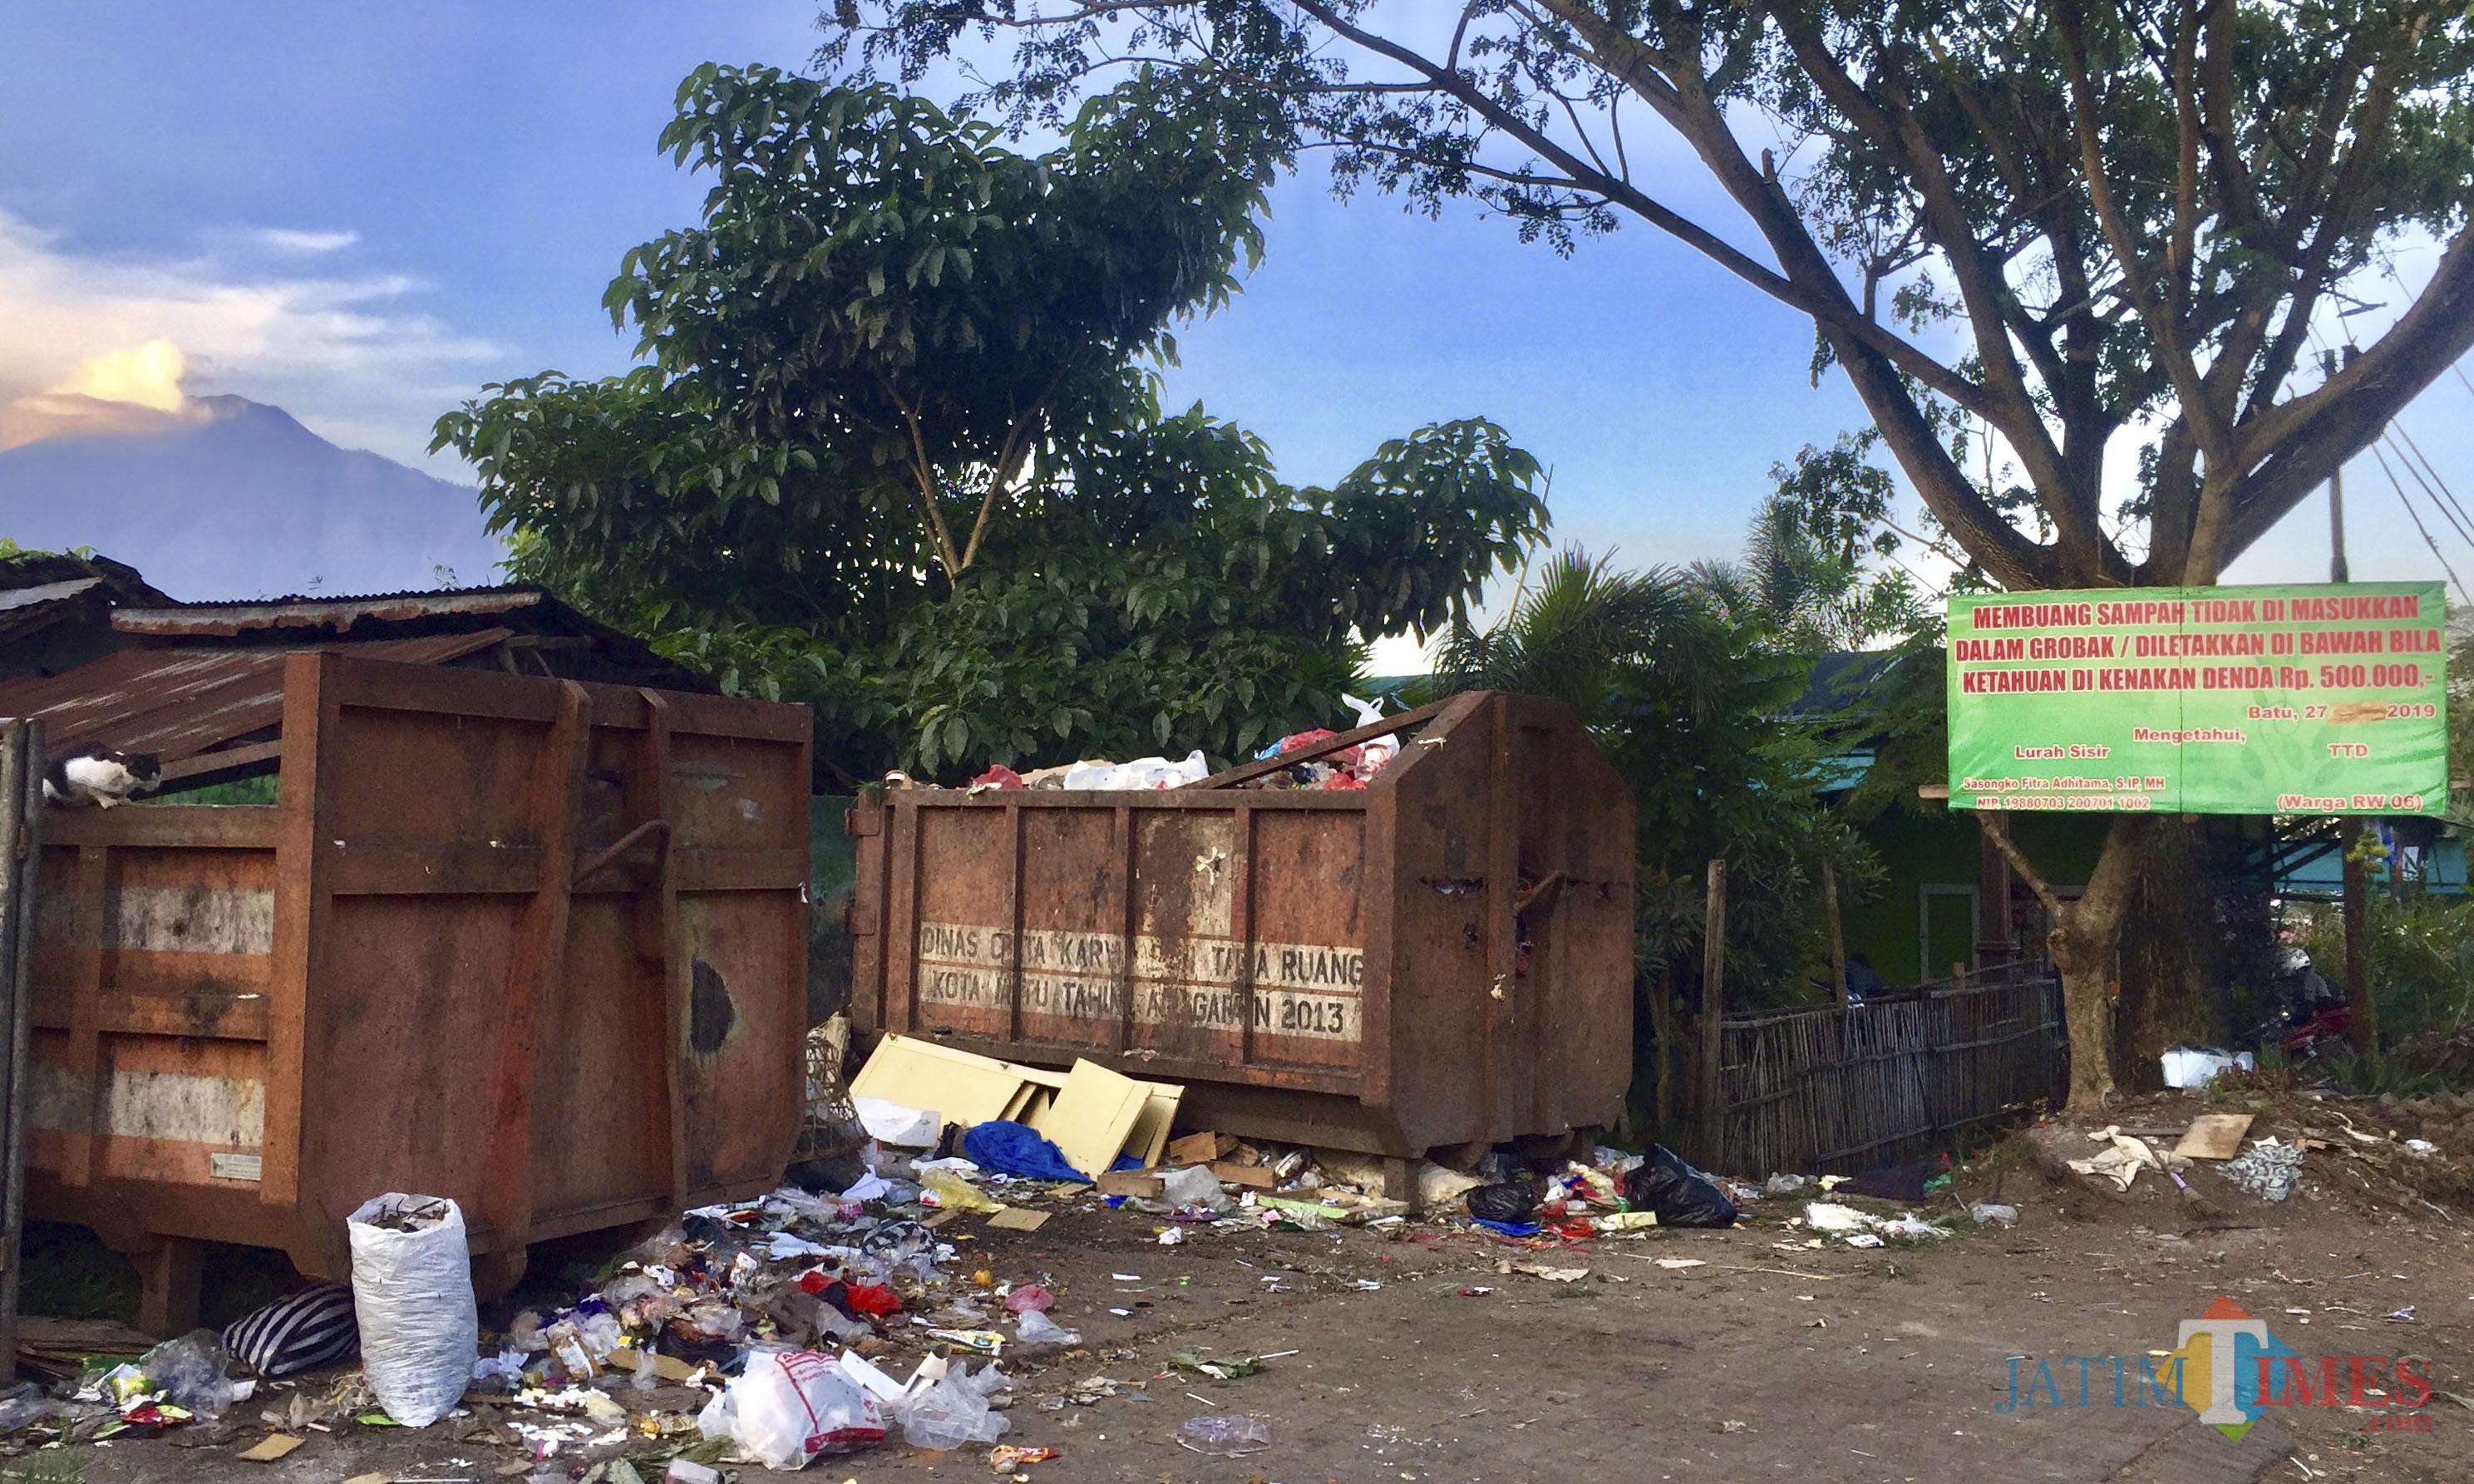 Papan pengumuman diberikan agar warga membuang sampah pada bak truk. (Foto: Irsya Richa/MalangTIMES)